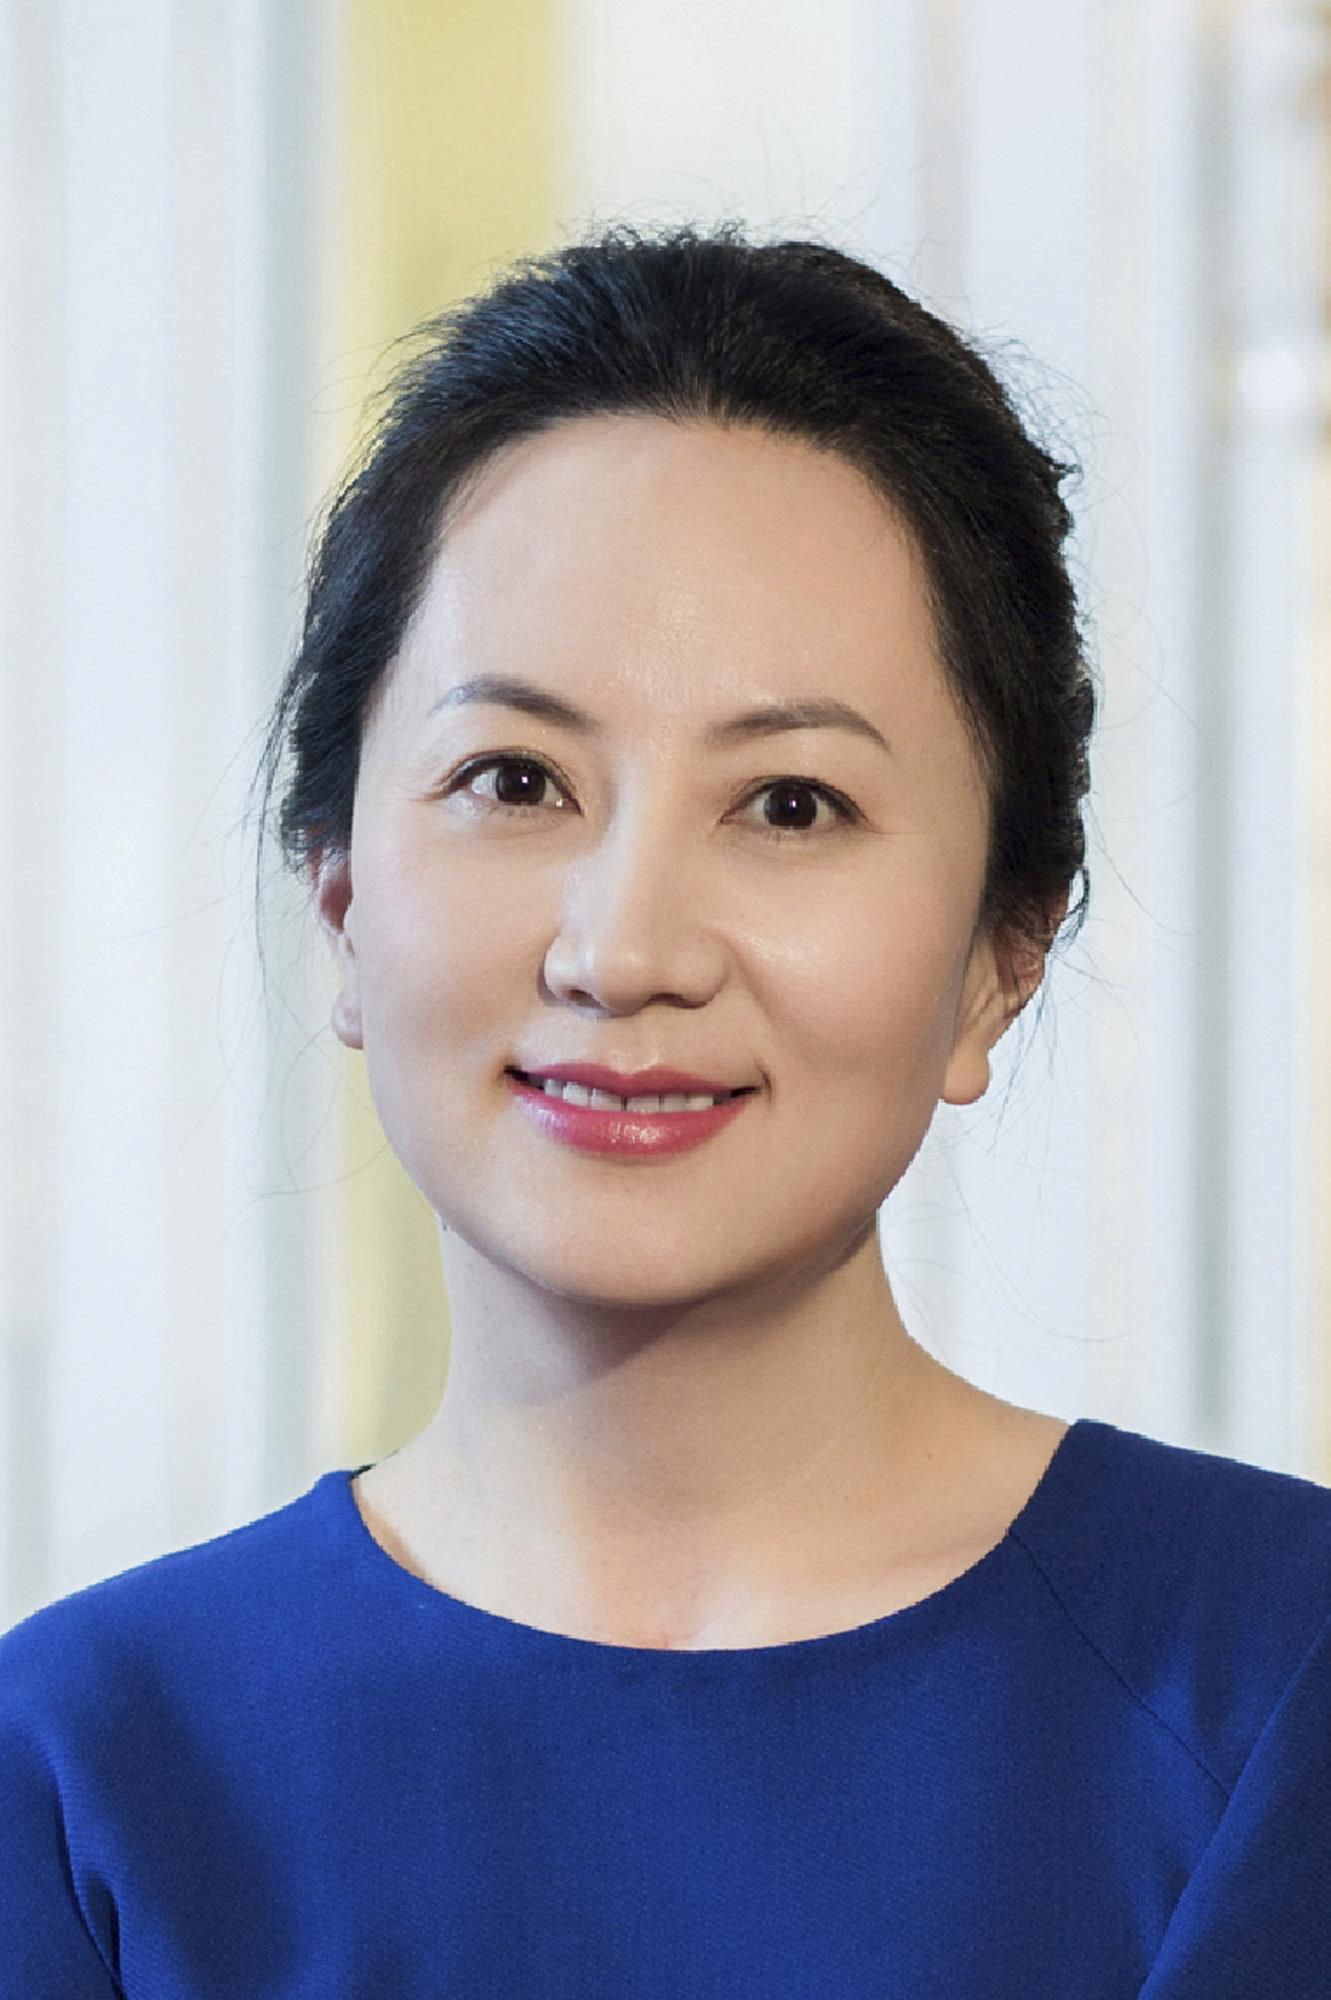 rencontres fille canadienne chinoise site de rencontre Poole